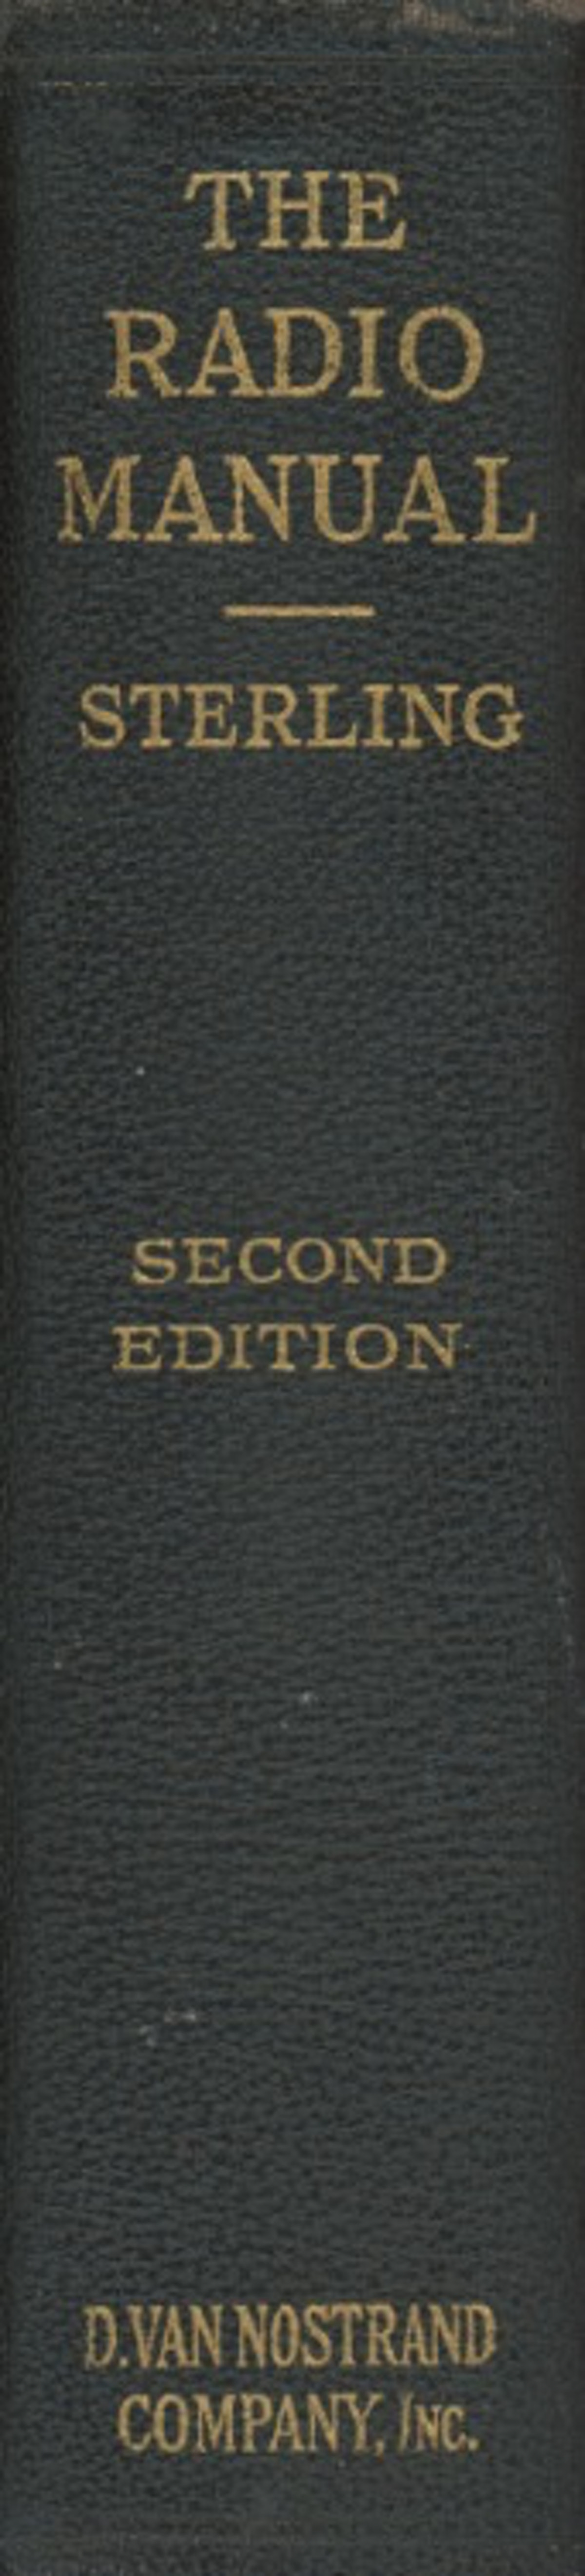 The Radio Manual